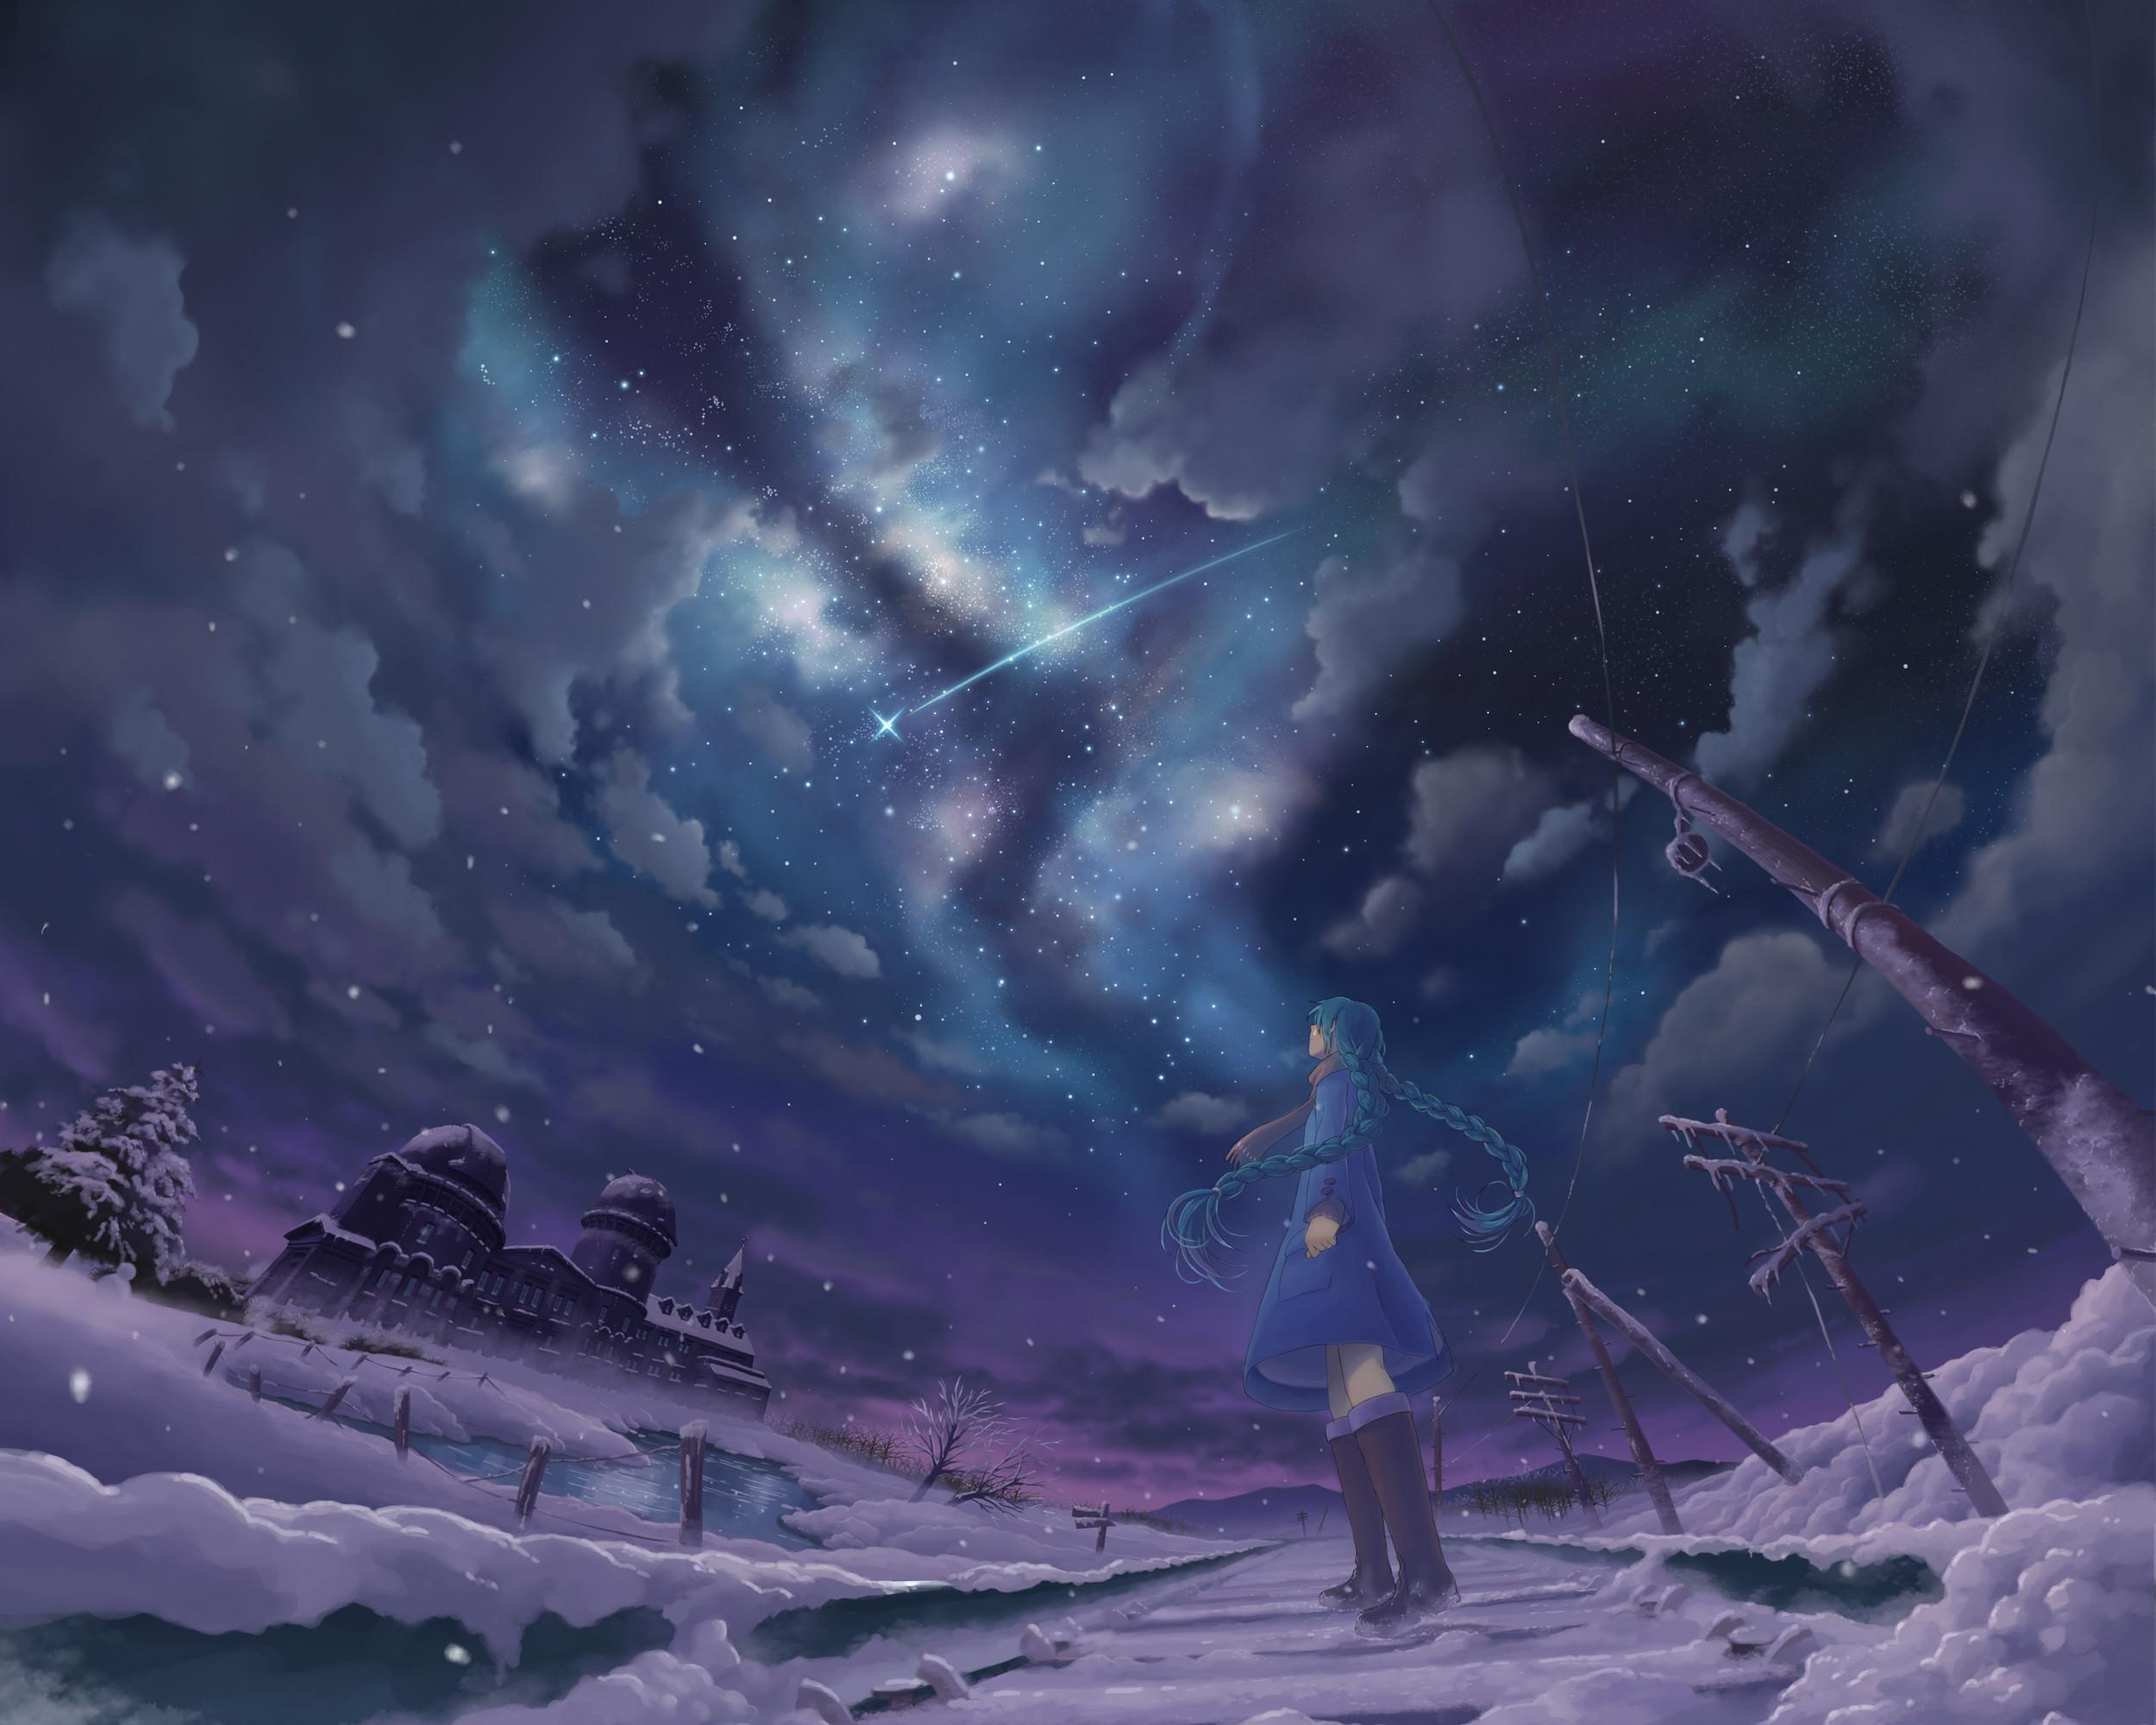 Res: 2500x2000, Wallpaper anime girls, snow, stars, night, winter, shooting stars